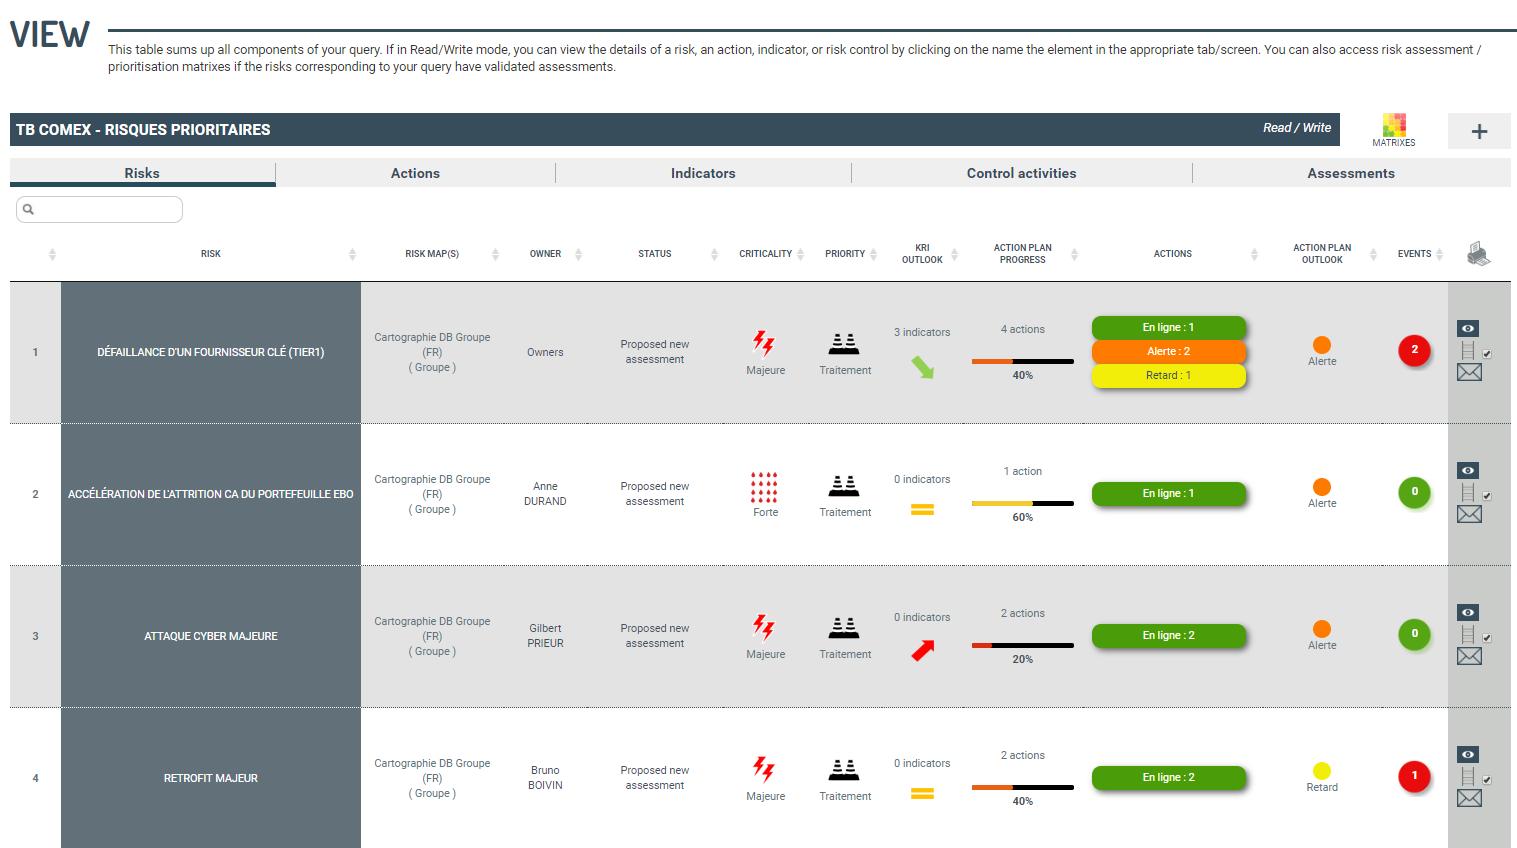 RMIS ArengiBox Risk Partner scopes